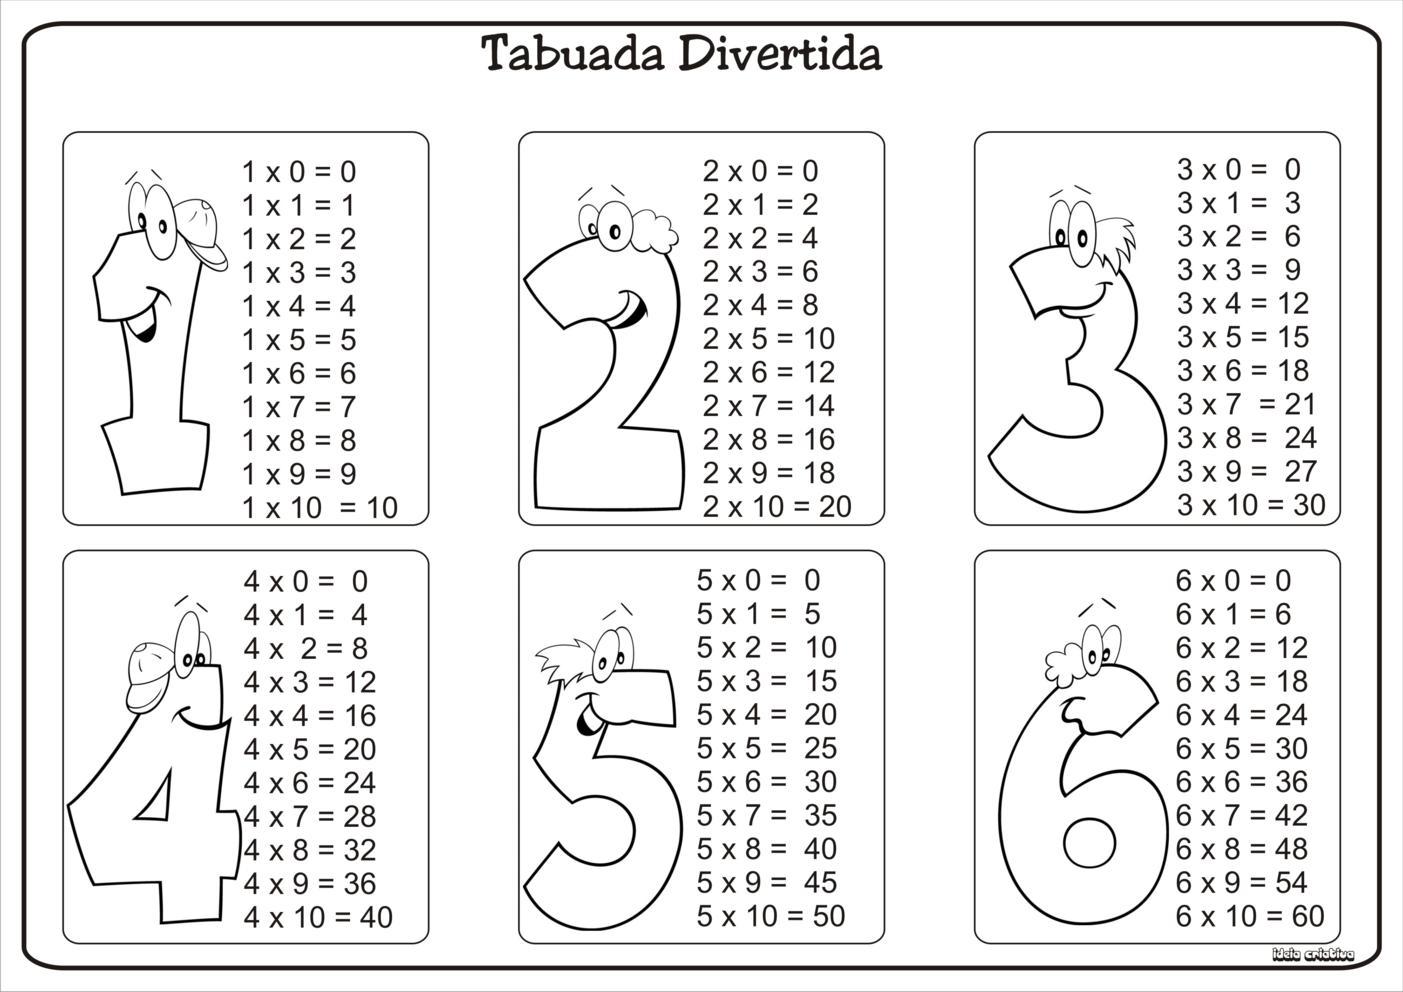 Tabuada Divertida Multiplicacao 1 A 9